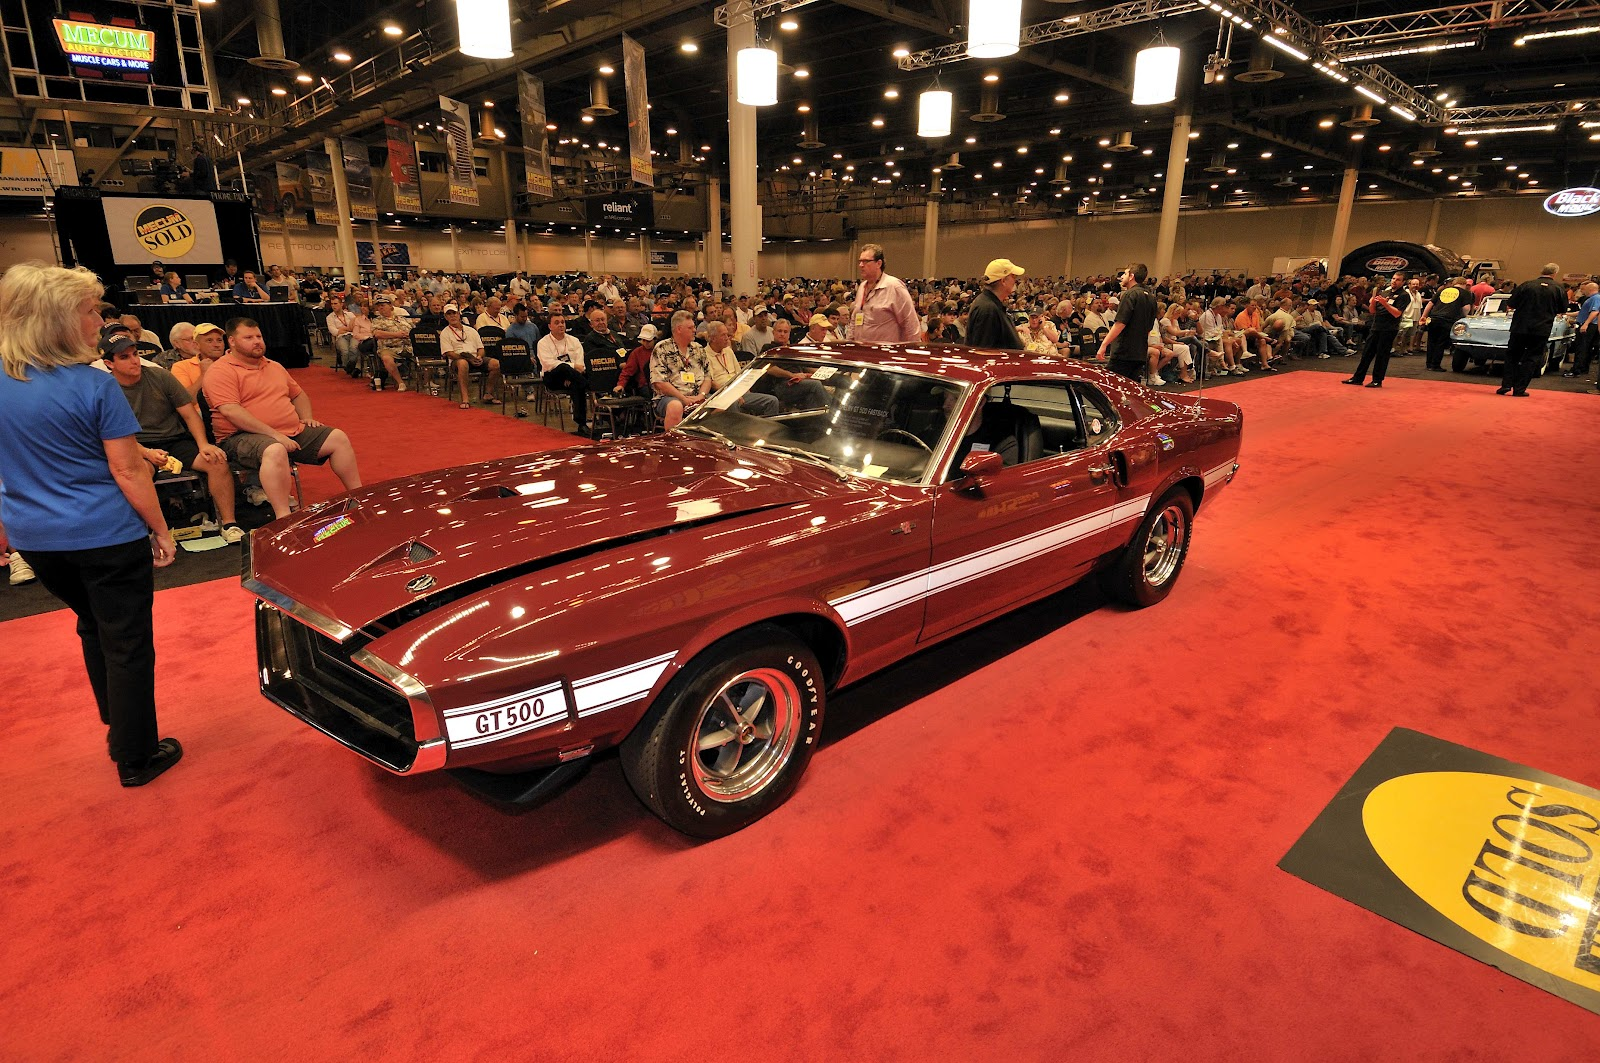 stephen cox 39 s blog live mecum classic car auction from. Black Bedroom Furniture Sets. Home Design Ideas